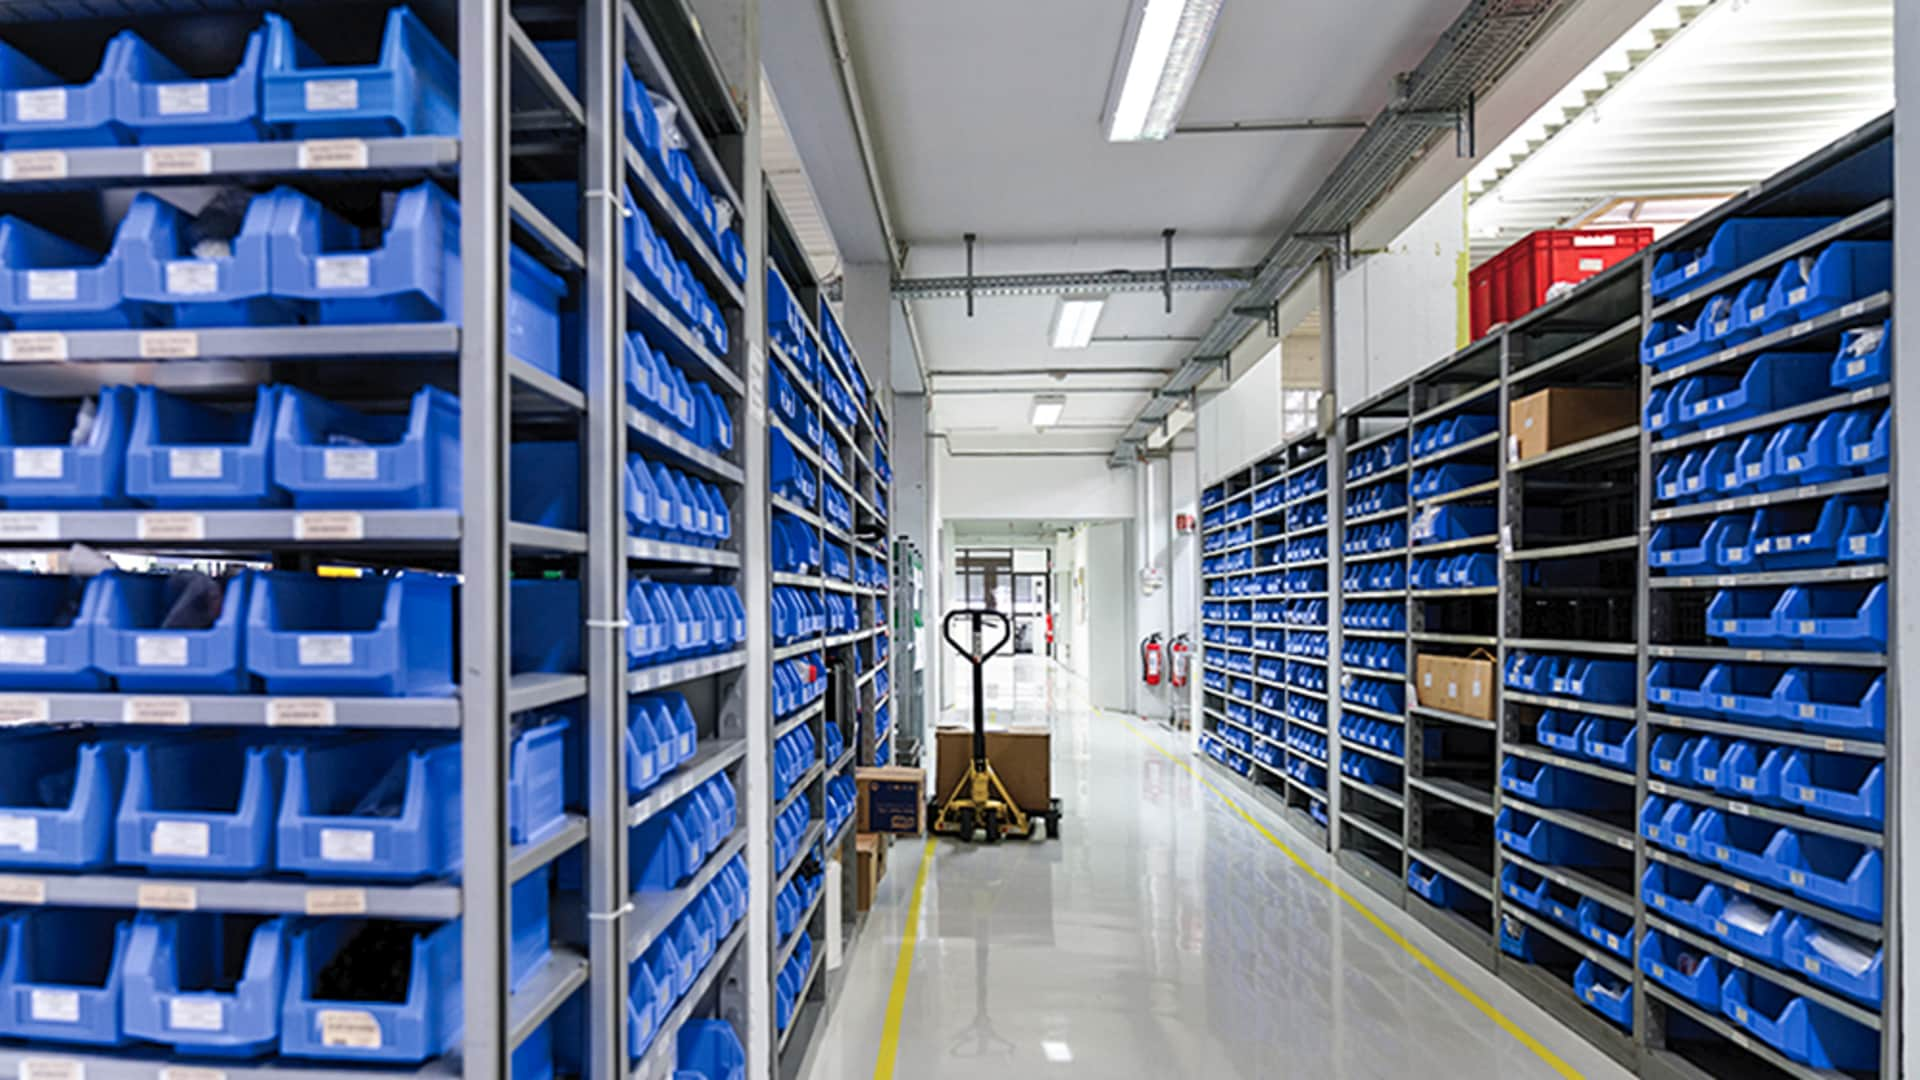 Prozessoptimierung bei Thermo Fisher Scientific in Karlsruhe